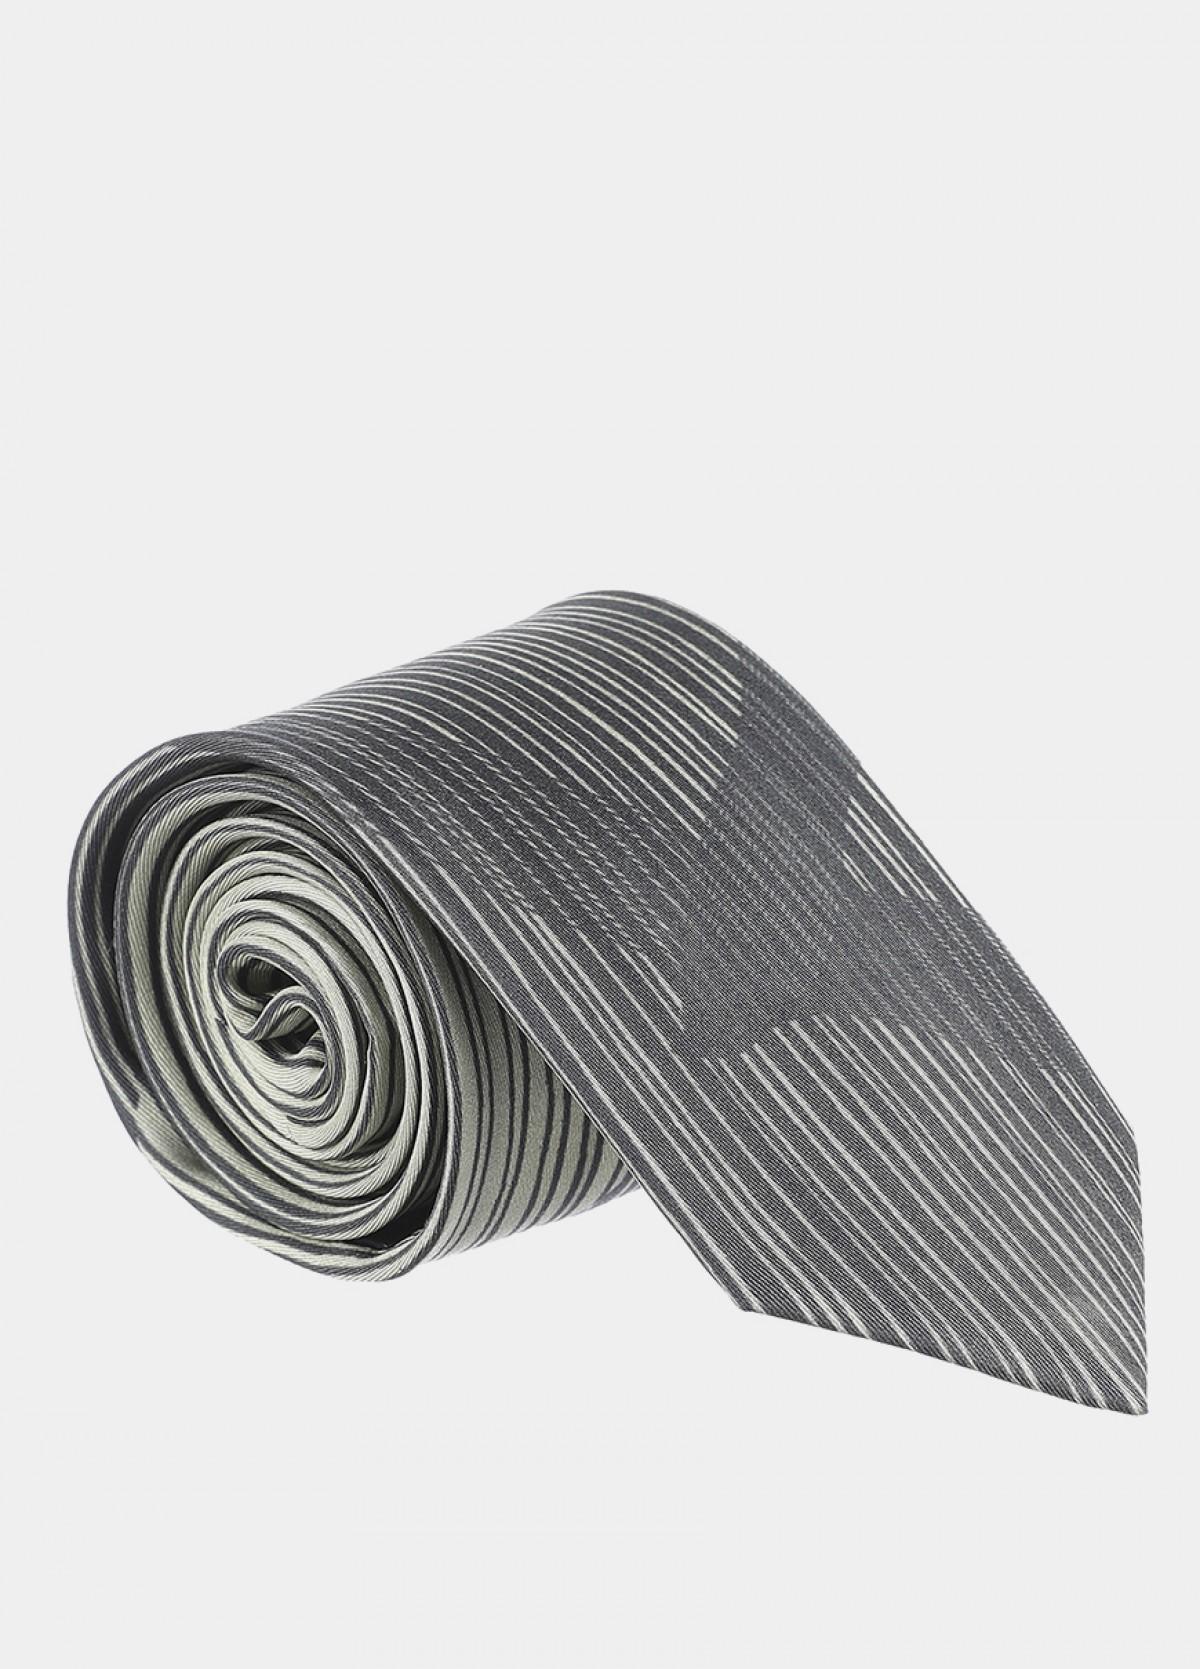 The Men'S Printed Tie